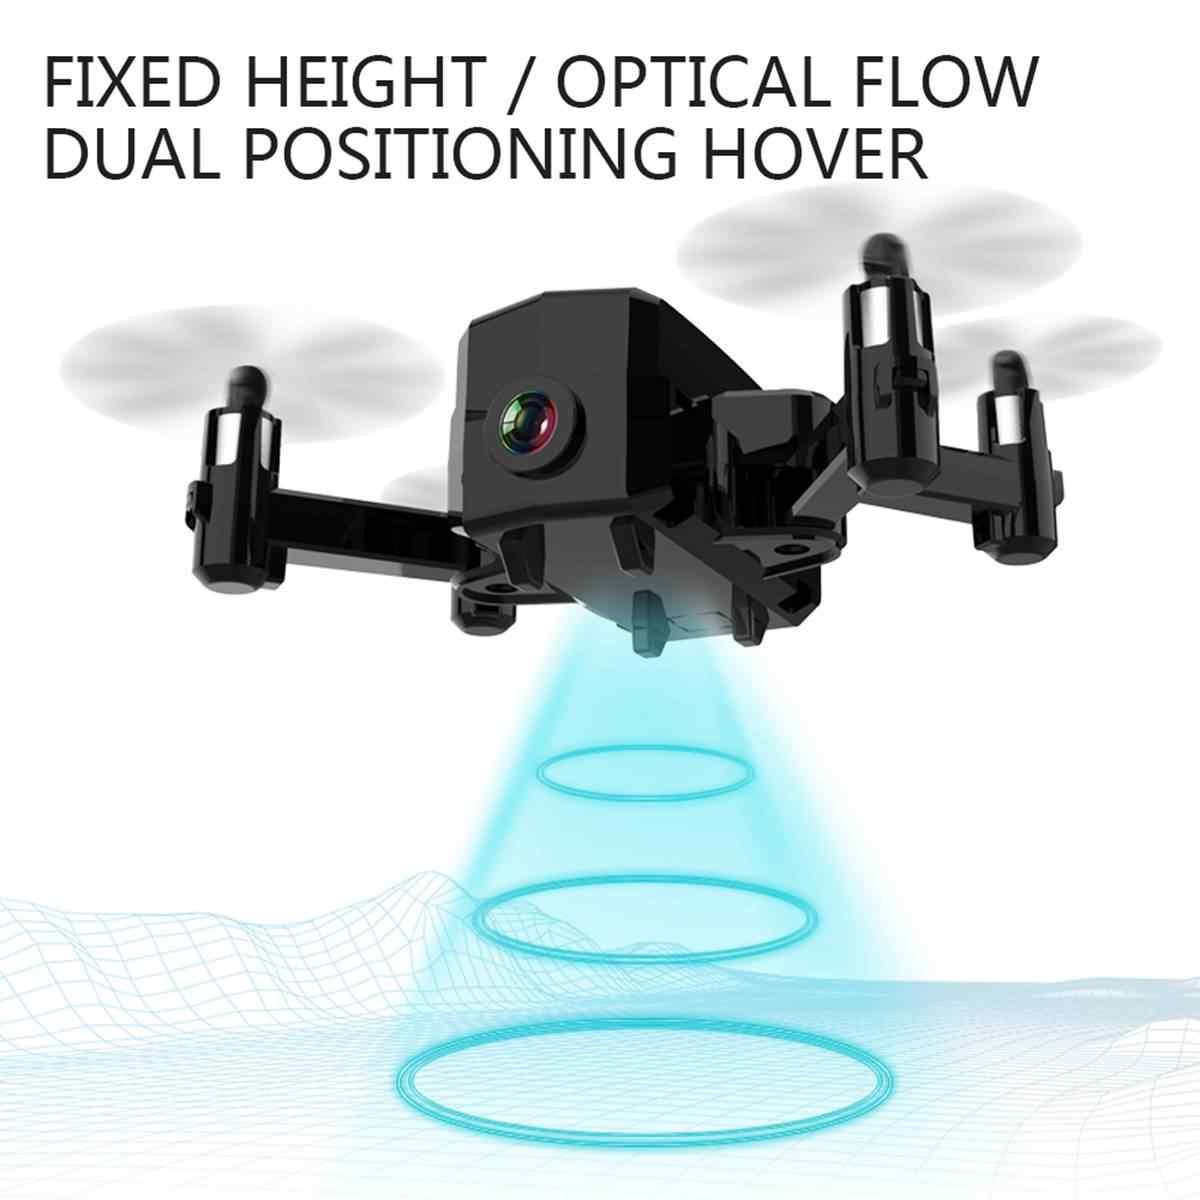 Мини складной Радиоуправляемый Дрон HD Квадрокоптер с камерой L102 WiFi FPV Смарт следующий складной карманный камера радиоуправляемые дроны Дрон батарея